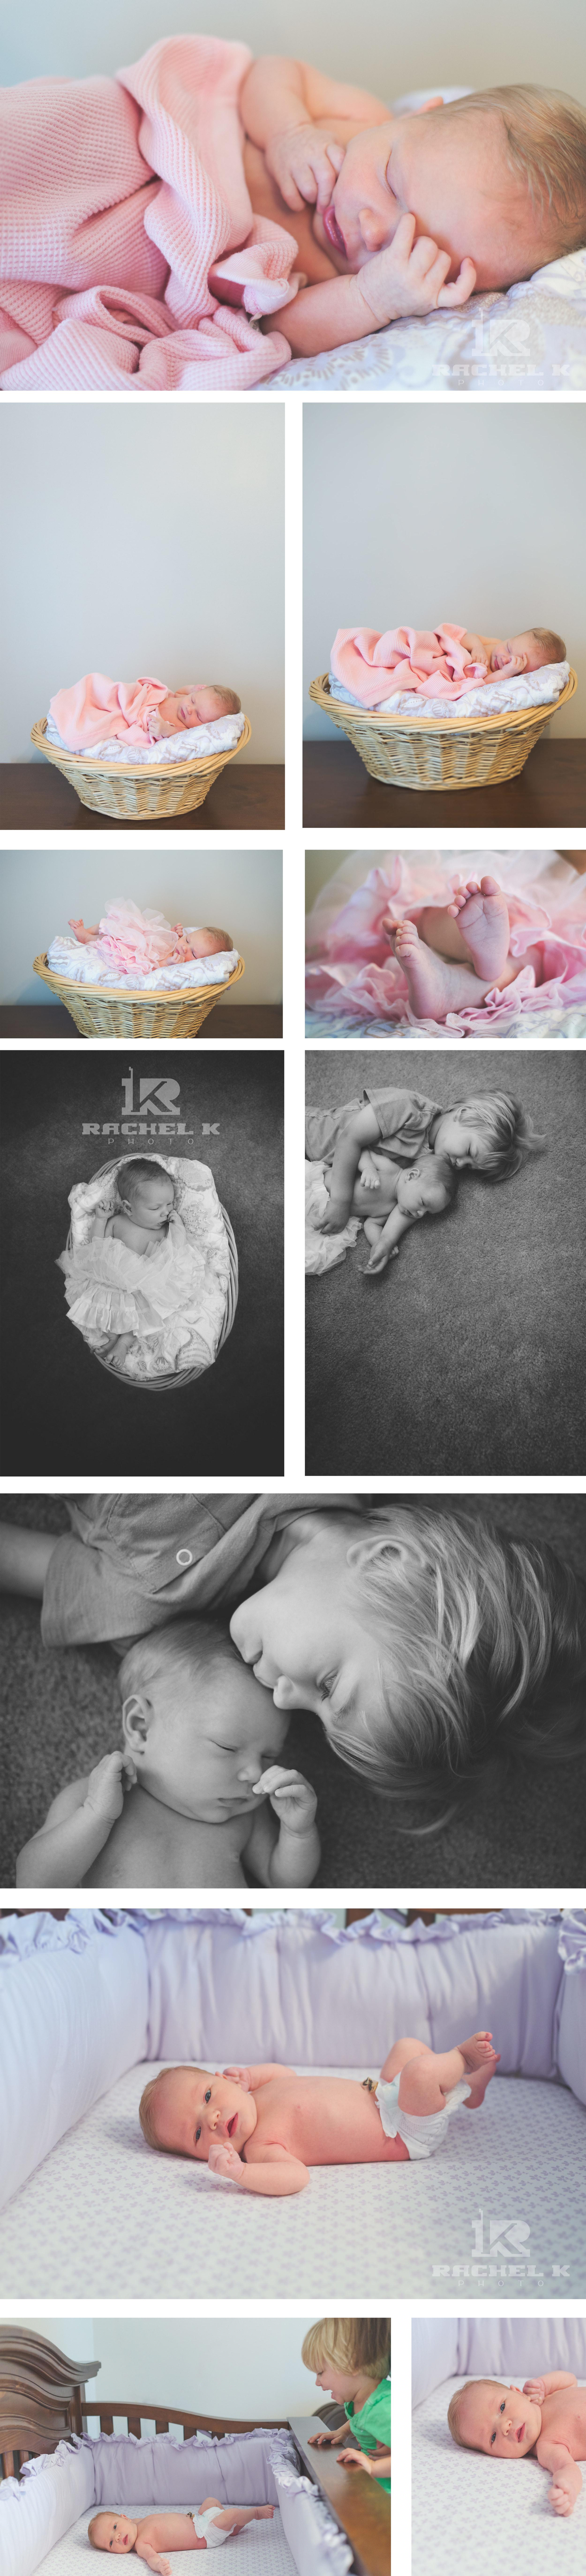 Rachel K Photo lifestyle session-newborn